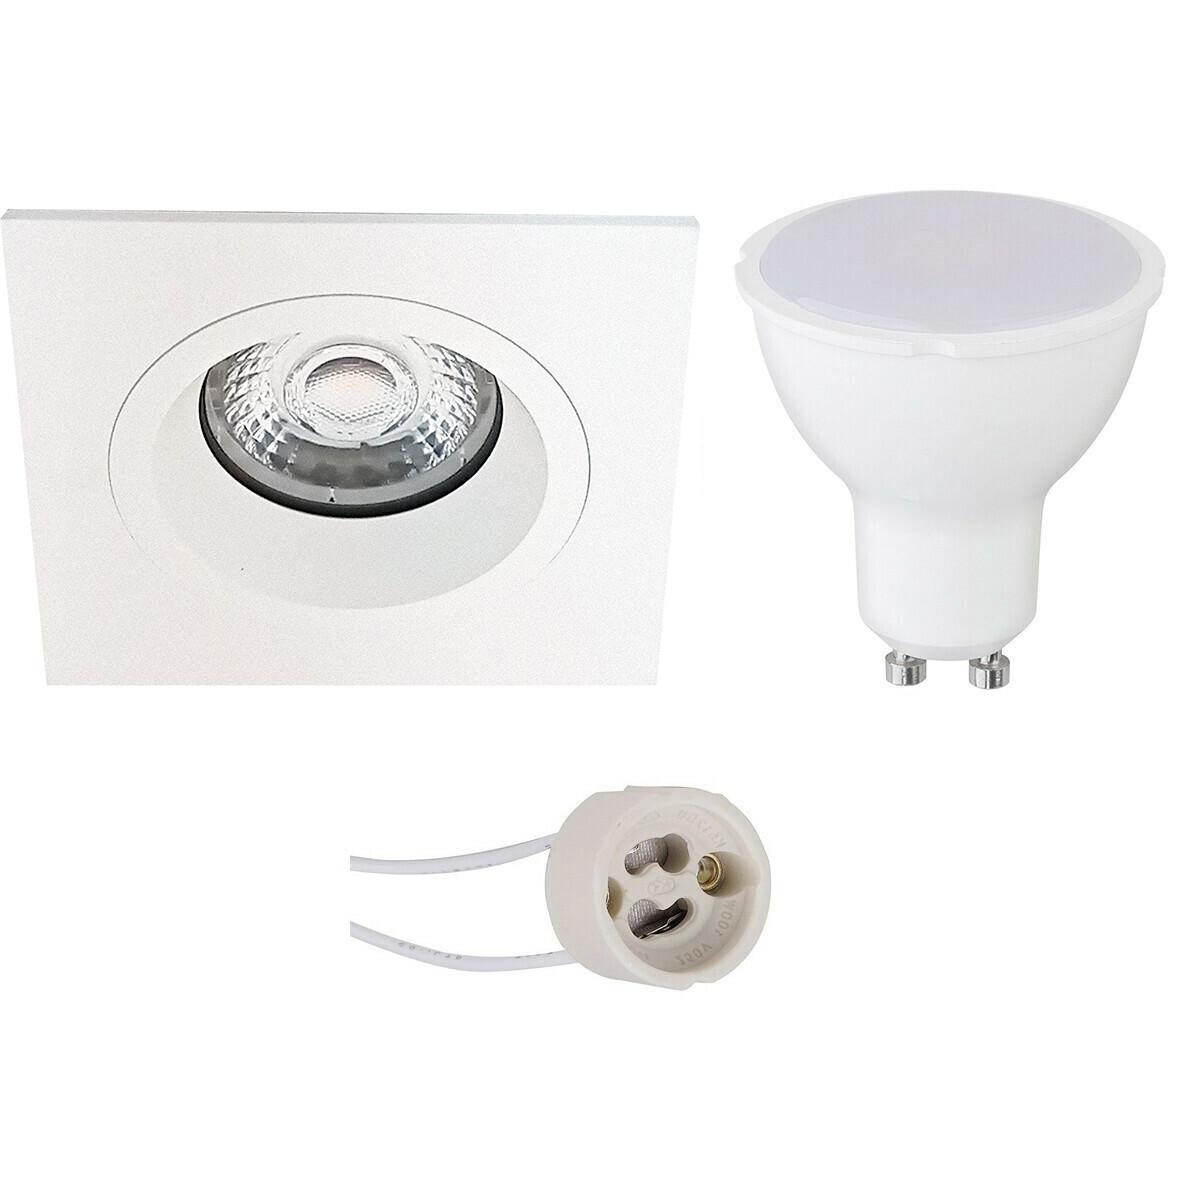 LED Spot Set - Pragmi Rodos Pro - GU10 Fitting - Inbouw Vierkant - Mat Wit - 6W - Natuurlijk Wit 420